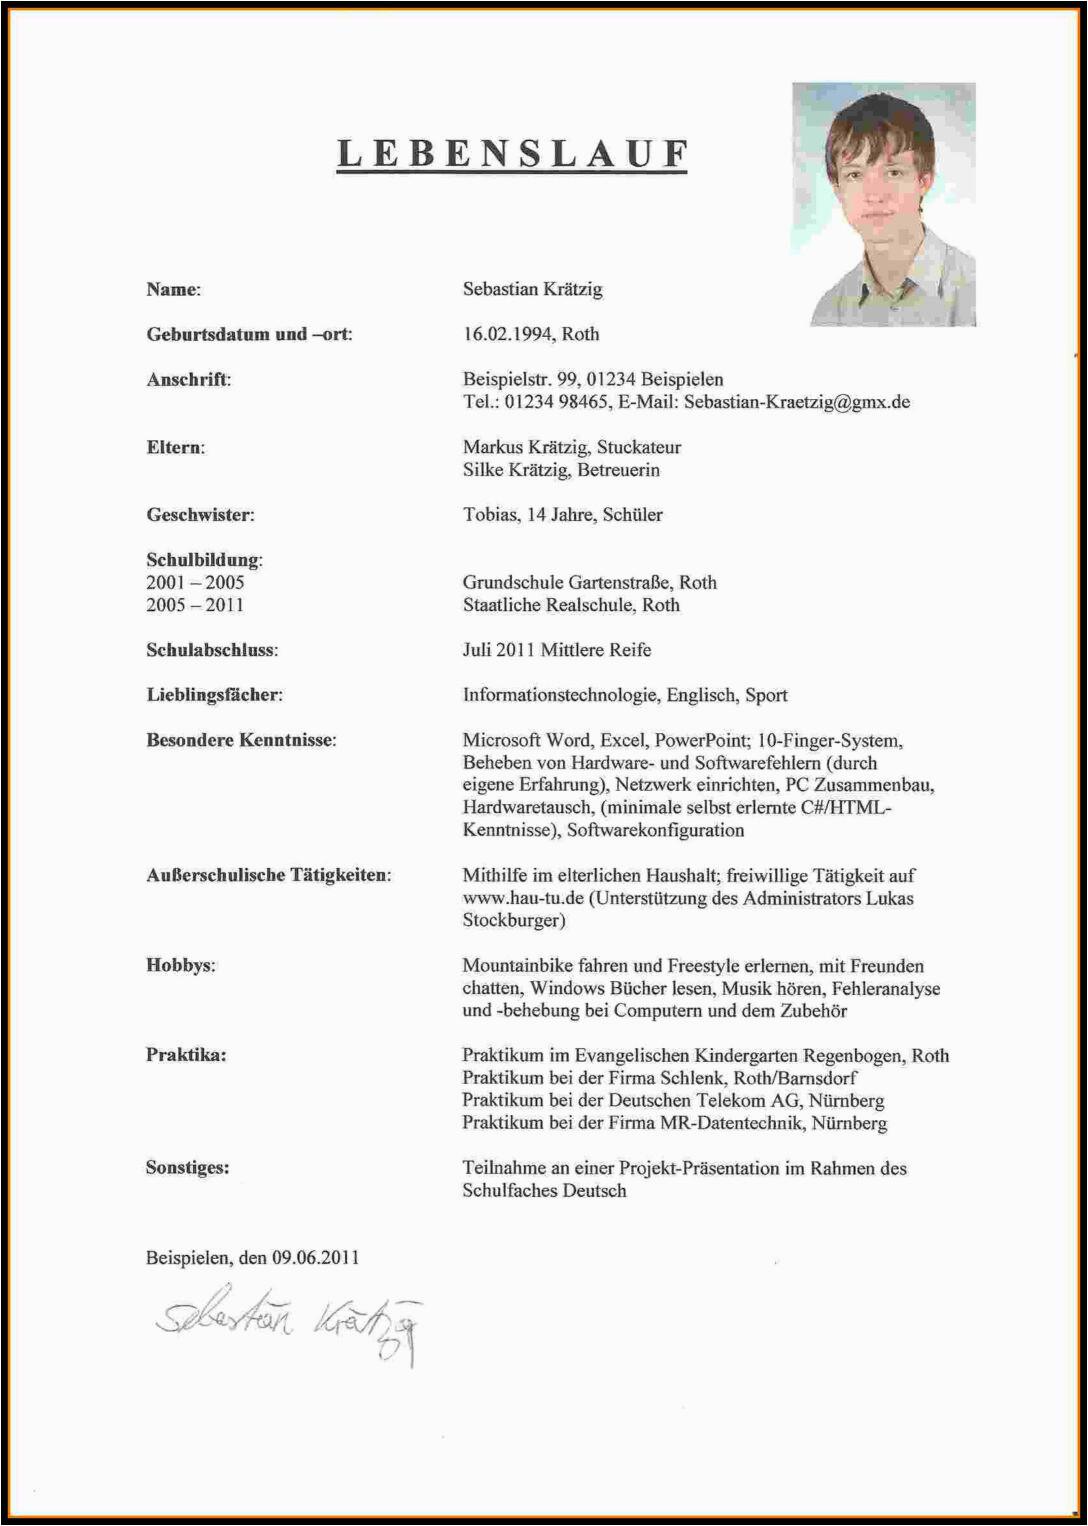 lebenslauf modell muster open office model pdf modelle word 2019 kostenlos deutschlandstipendium doc xing 11 12 probe lebenslufe sozialarbeiter foer